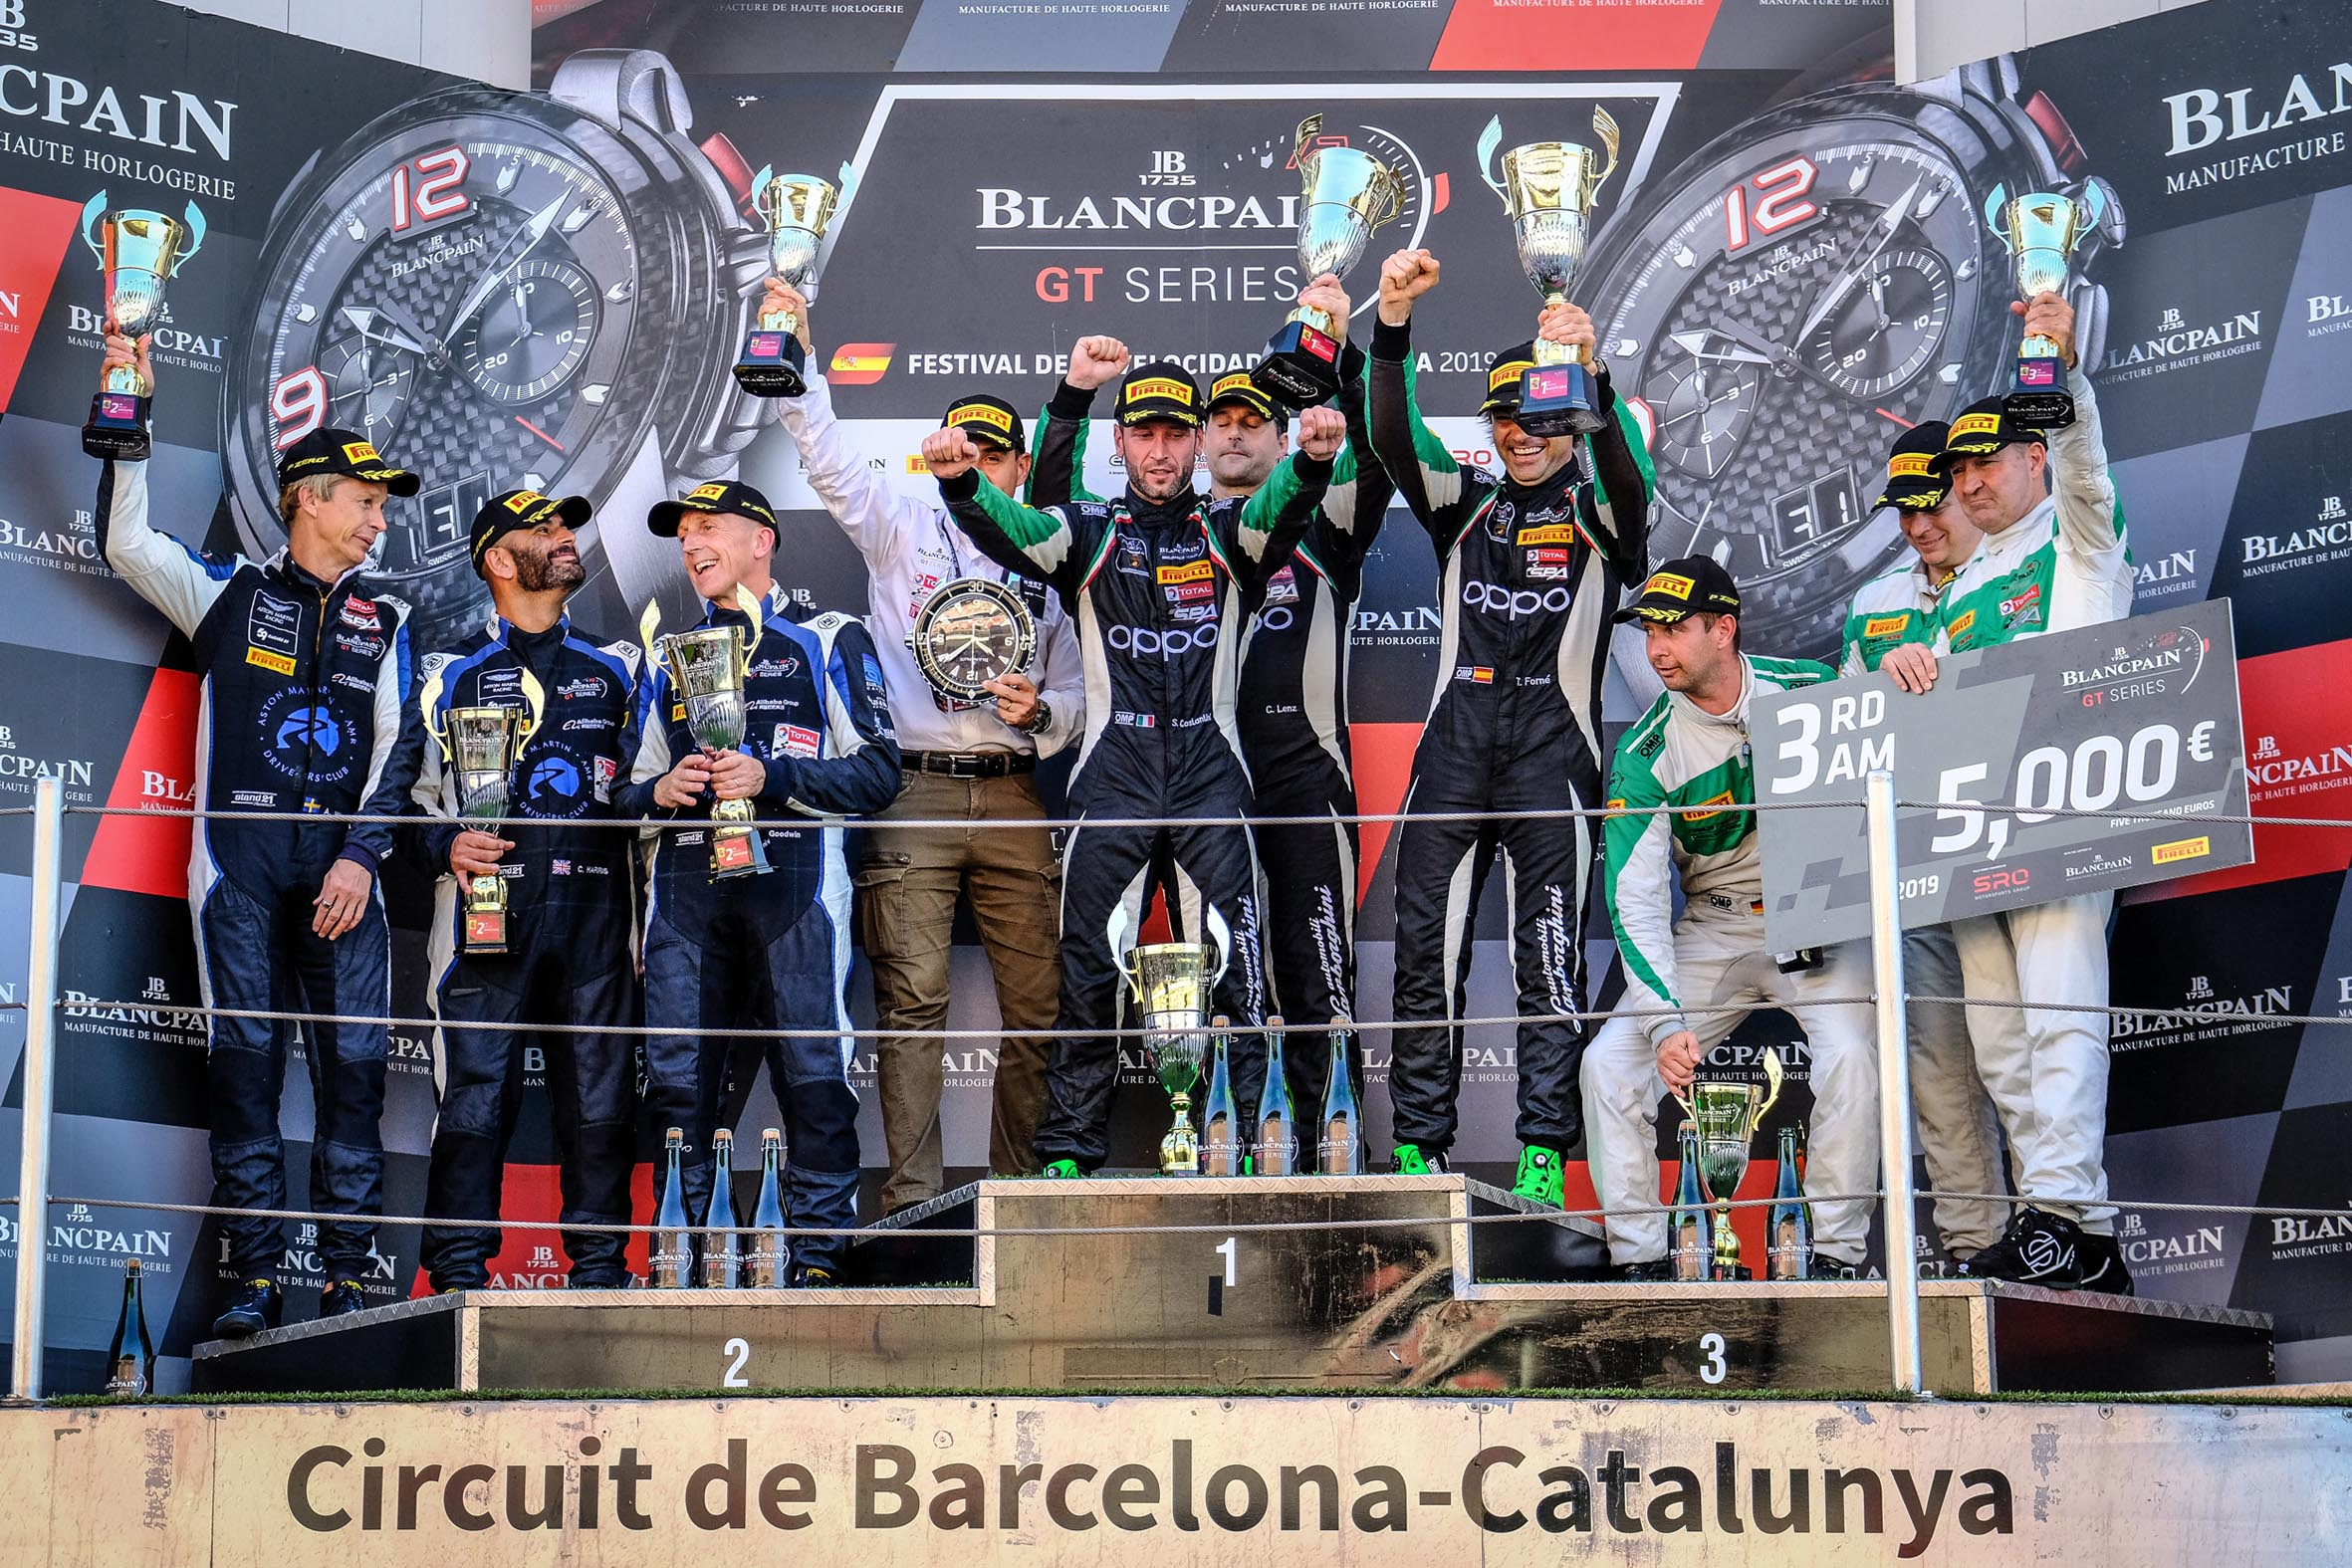 Raton by Target trionfa a Barcellona nella AM Cup del campionato Blancpain